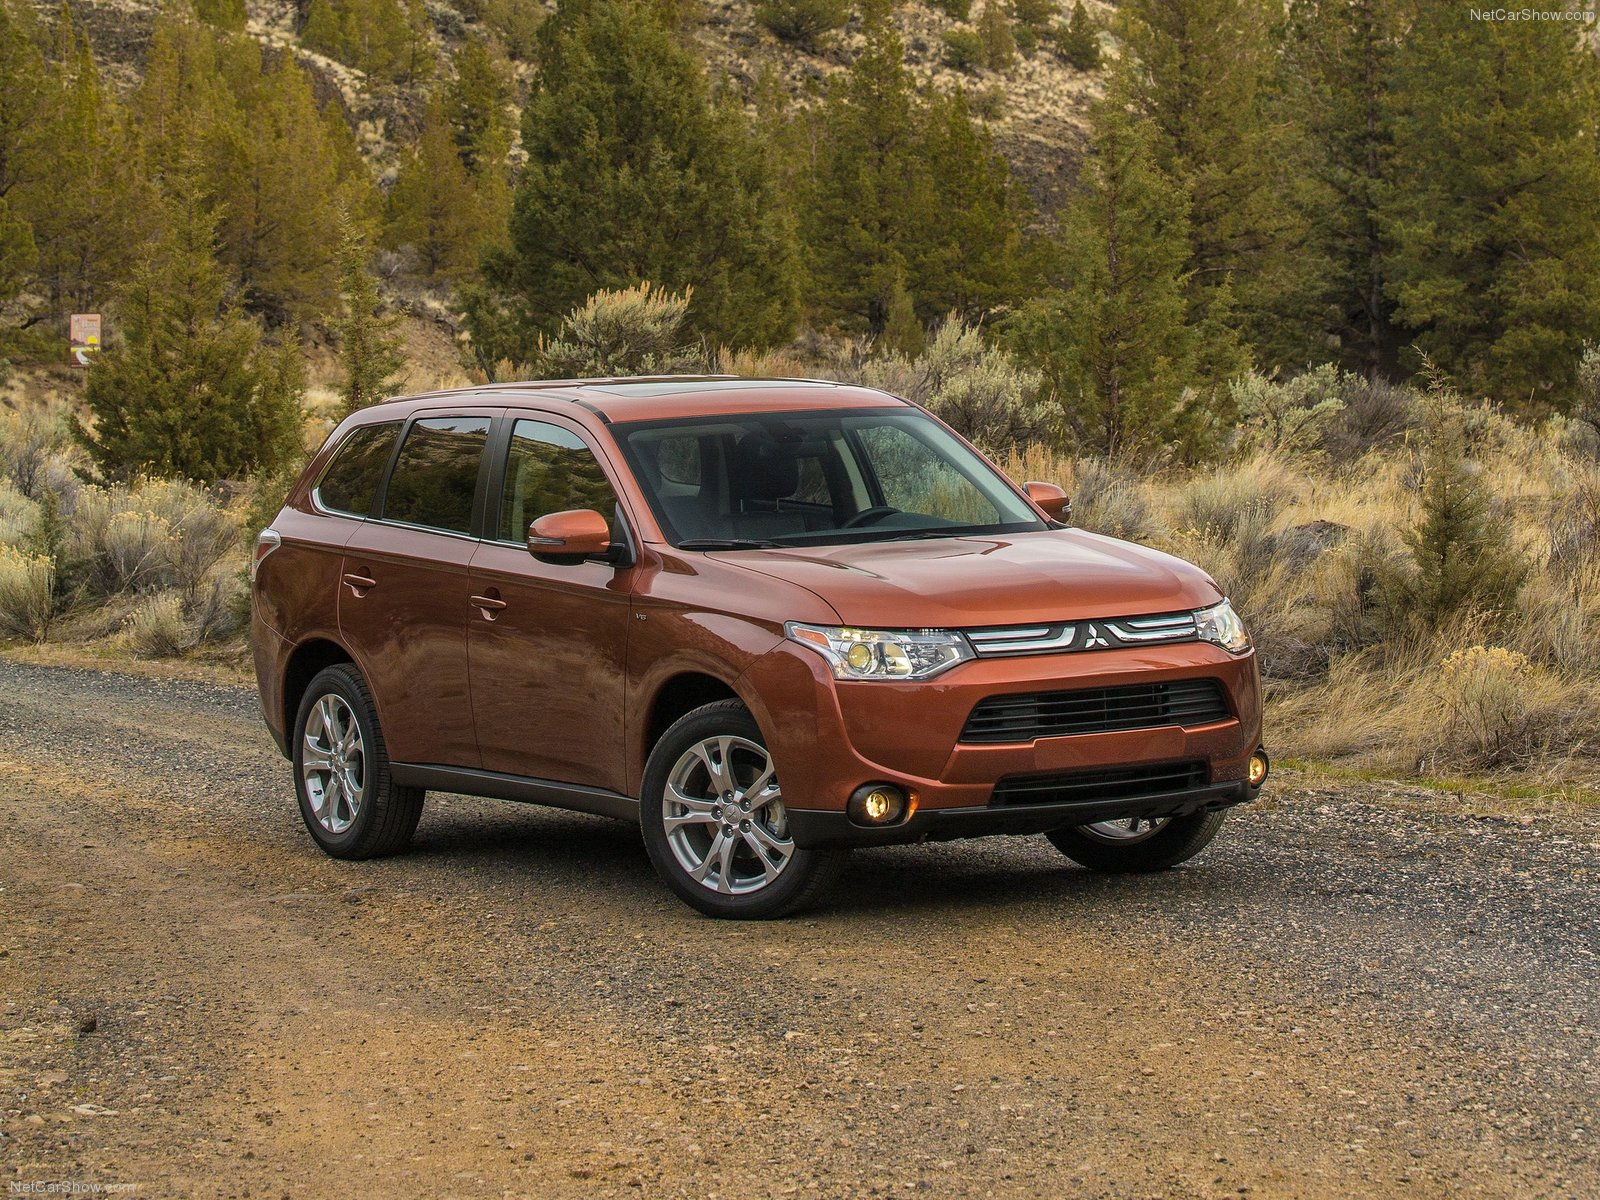 Mitsubishi Outlander Recalled Over Power Steering Problem